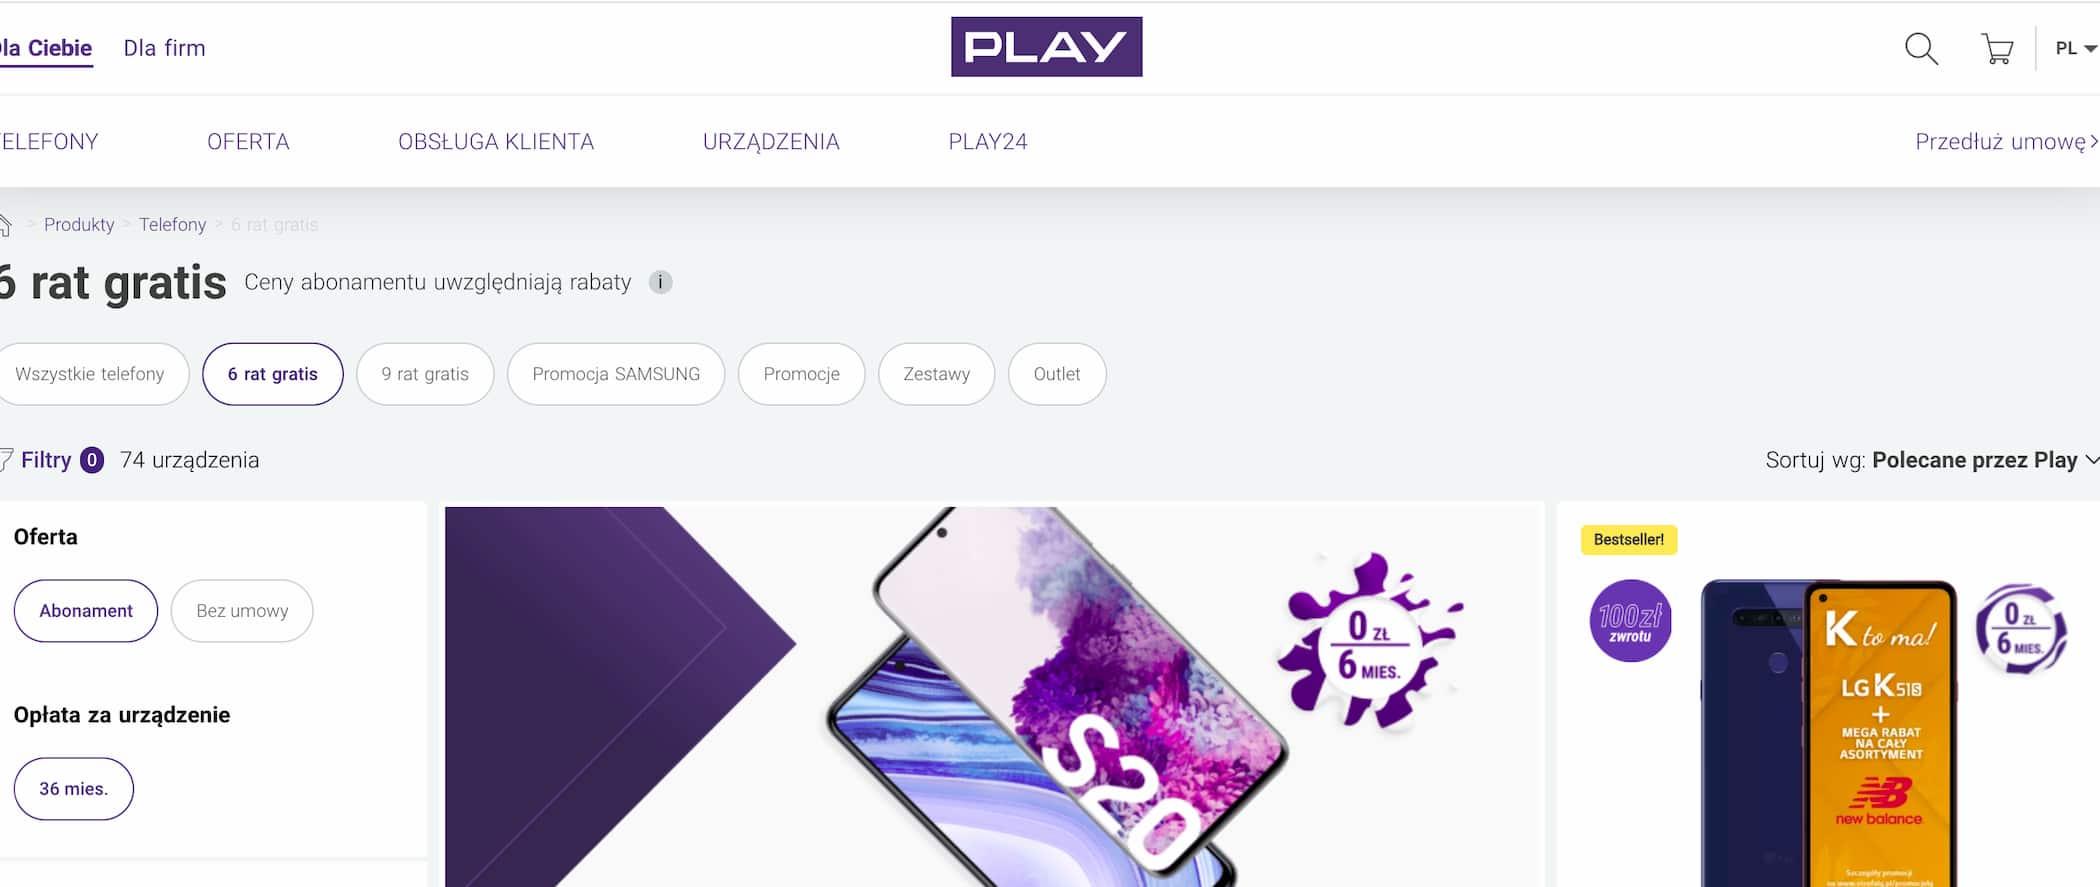 Gioca operatore telefonico Polonia